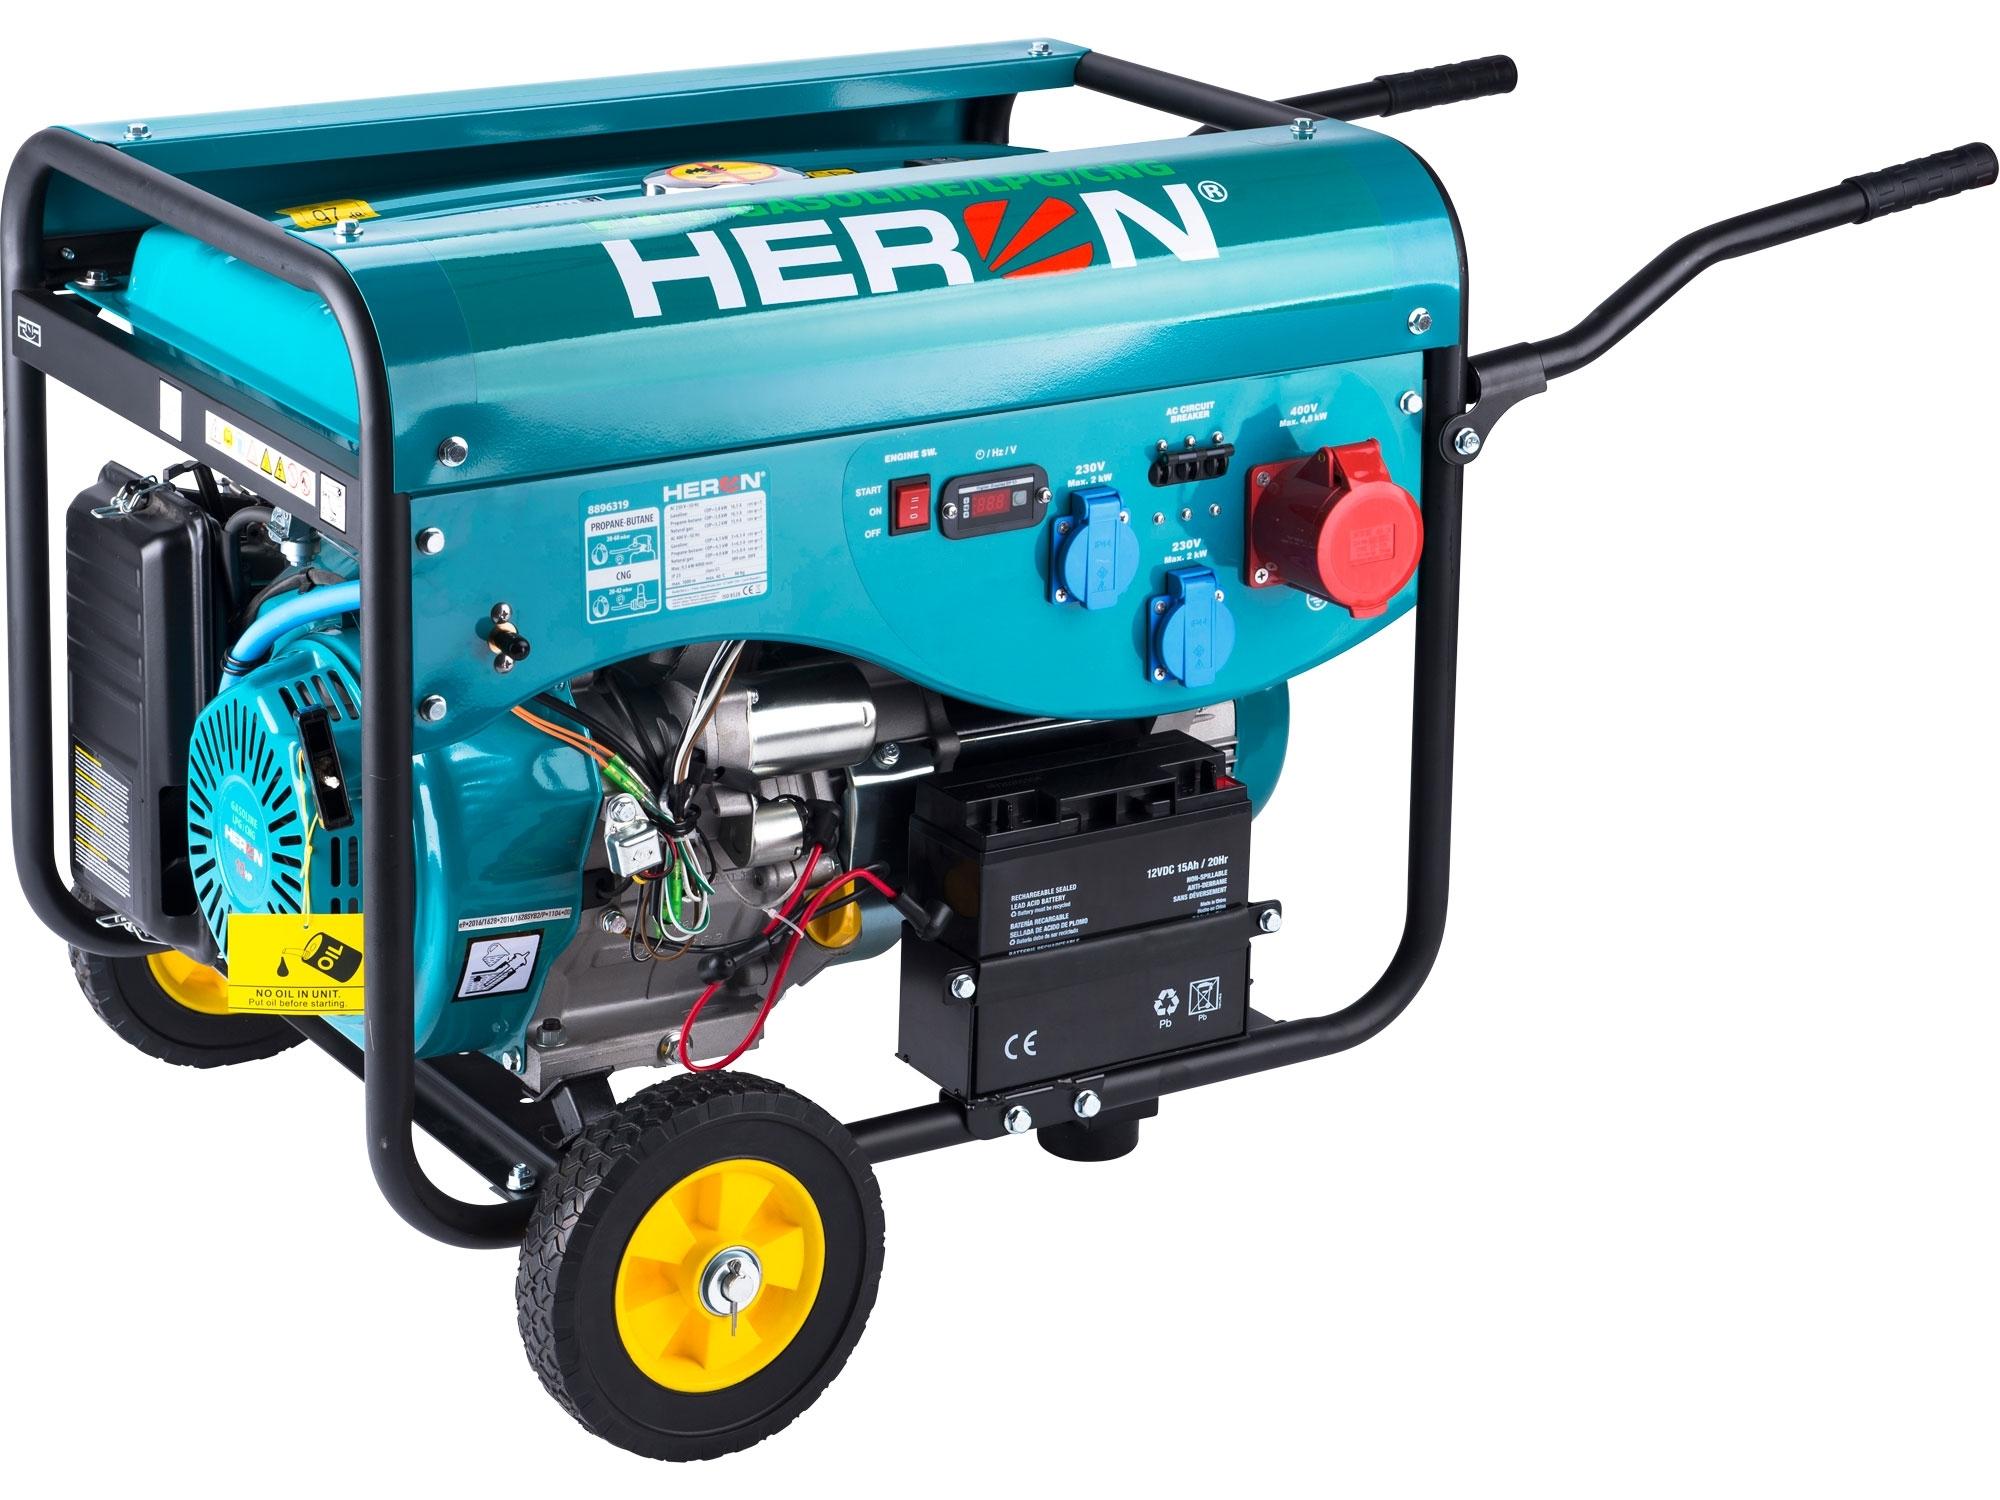 elektrocentrála benzínová a plynová (LGP/NG) 13HP/5,3kW (400V) 2x2,1kW (230V), elektrický start, HERON, LPGG 43-3F 8896319